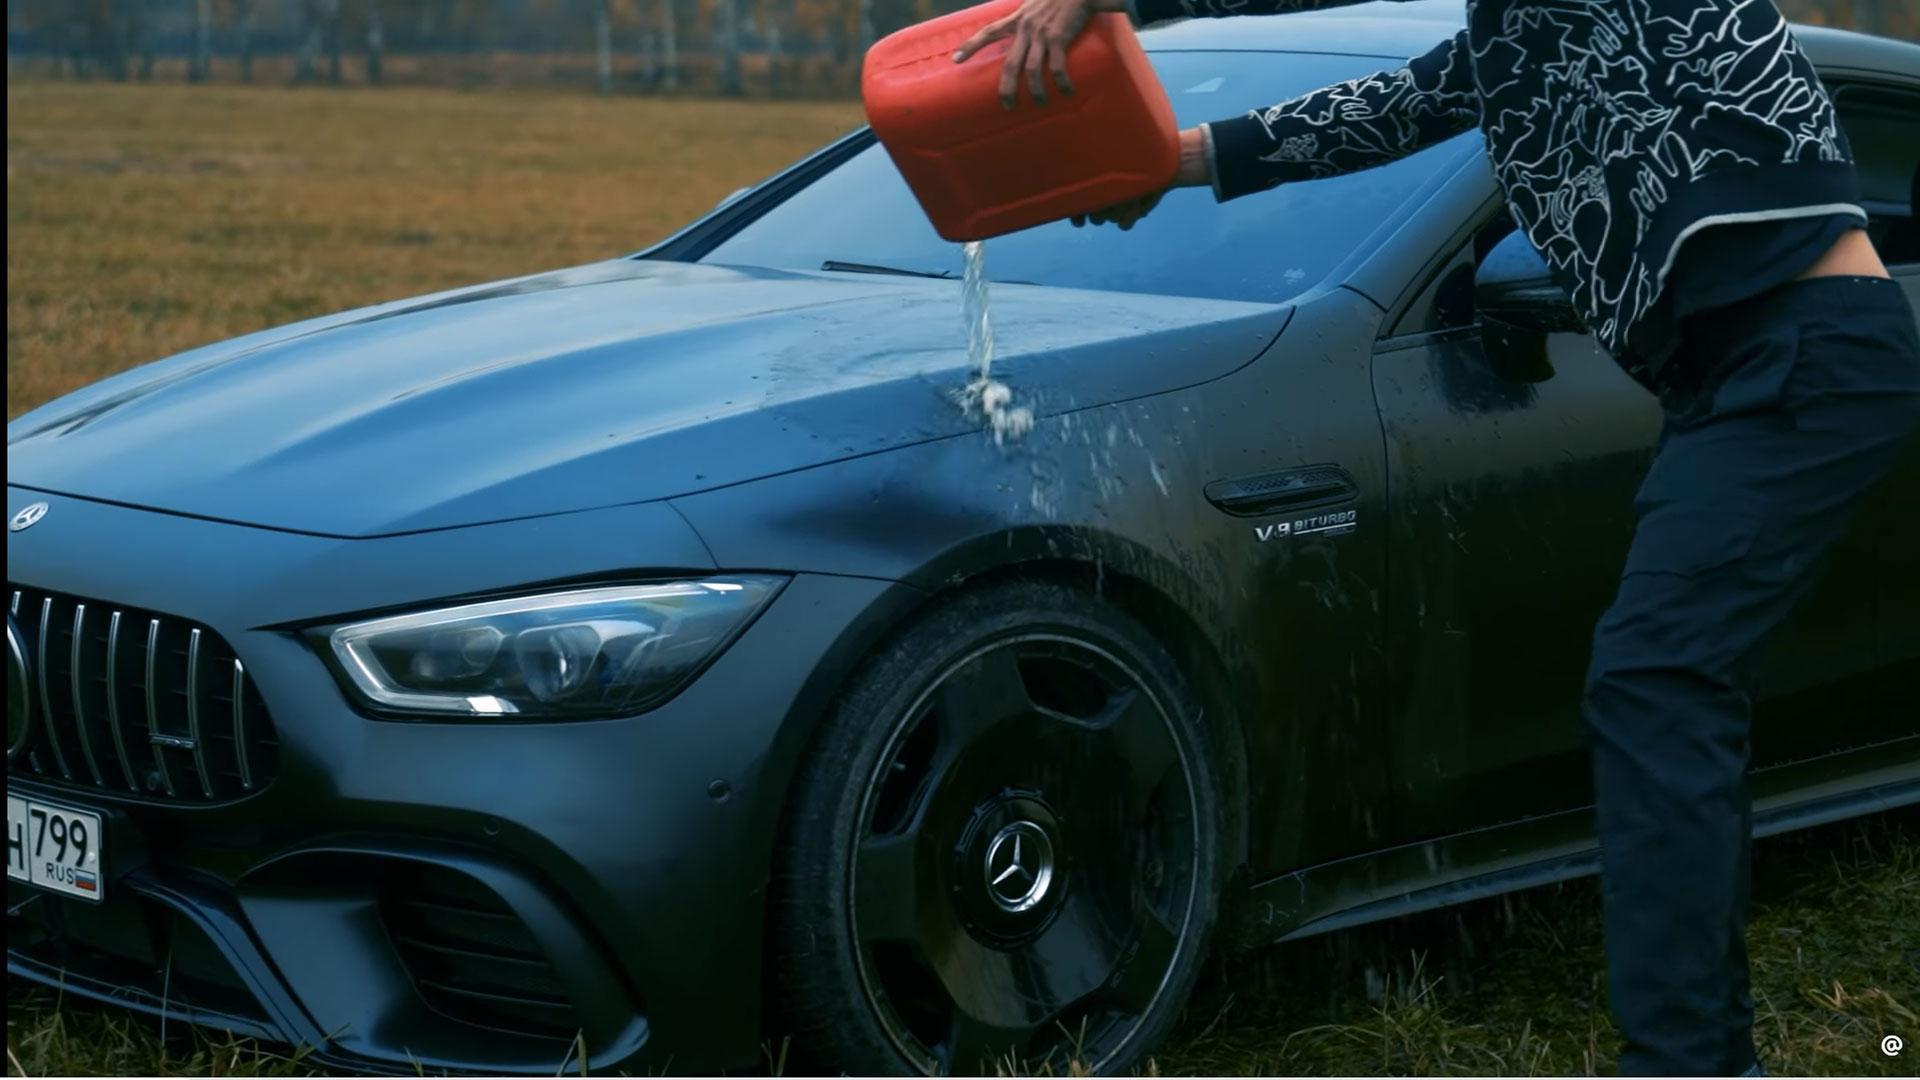 YouTuber steekt Mercedes-AMG GT 63 S in de brand